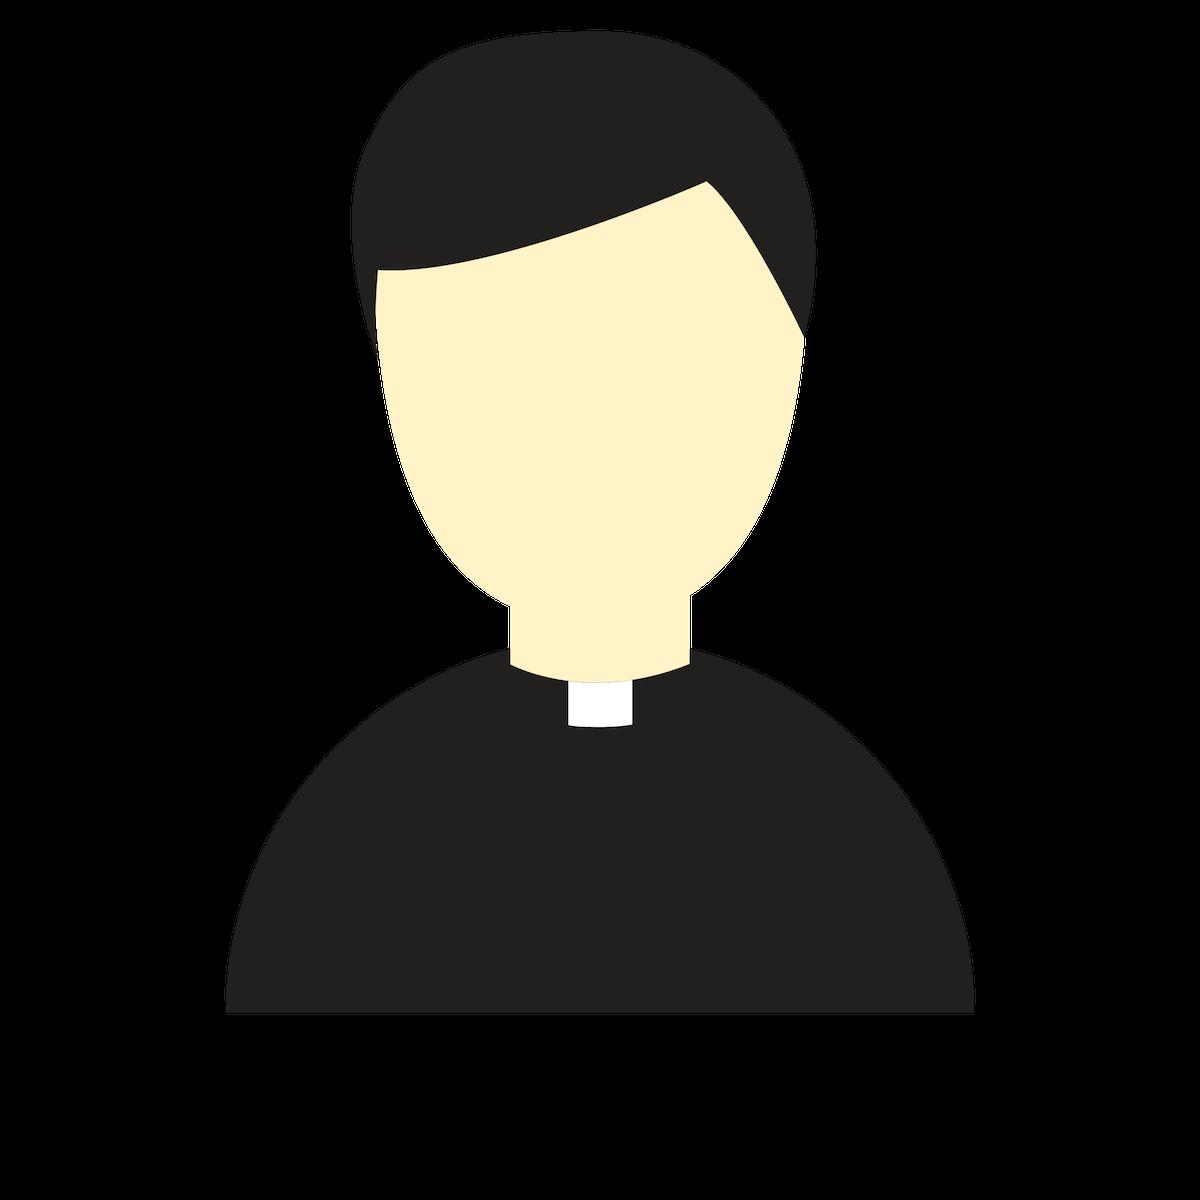 religionicon